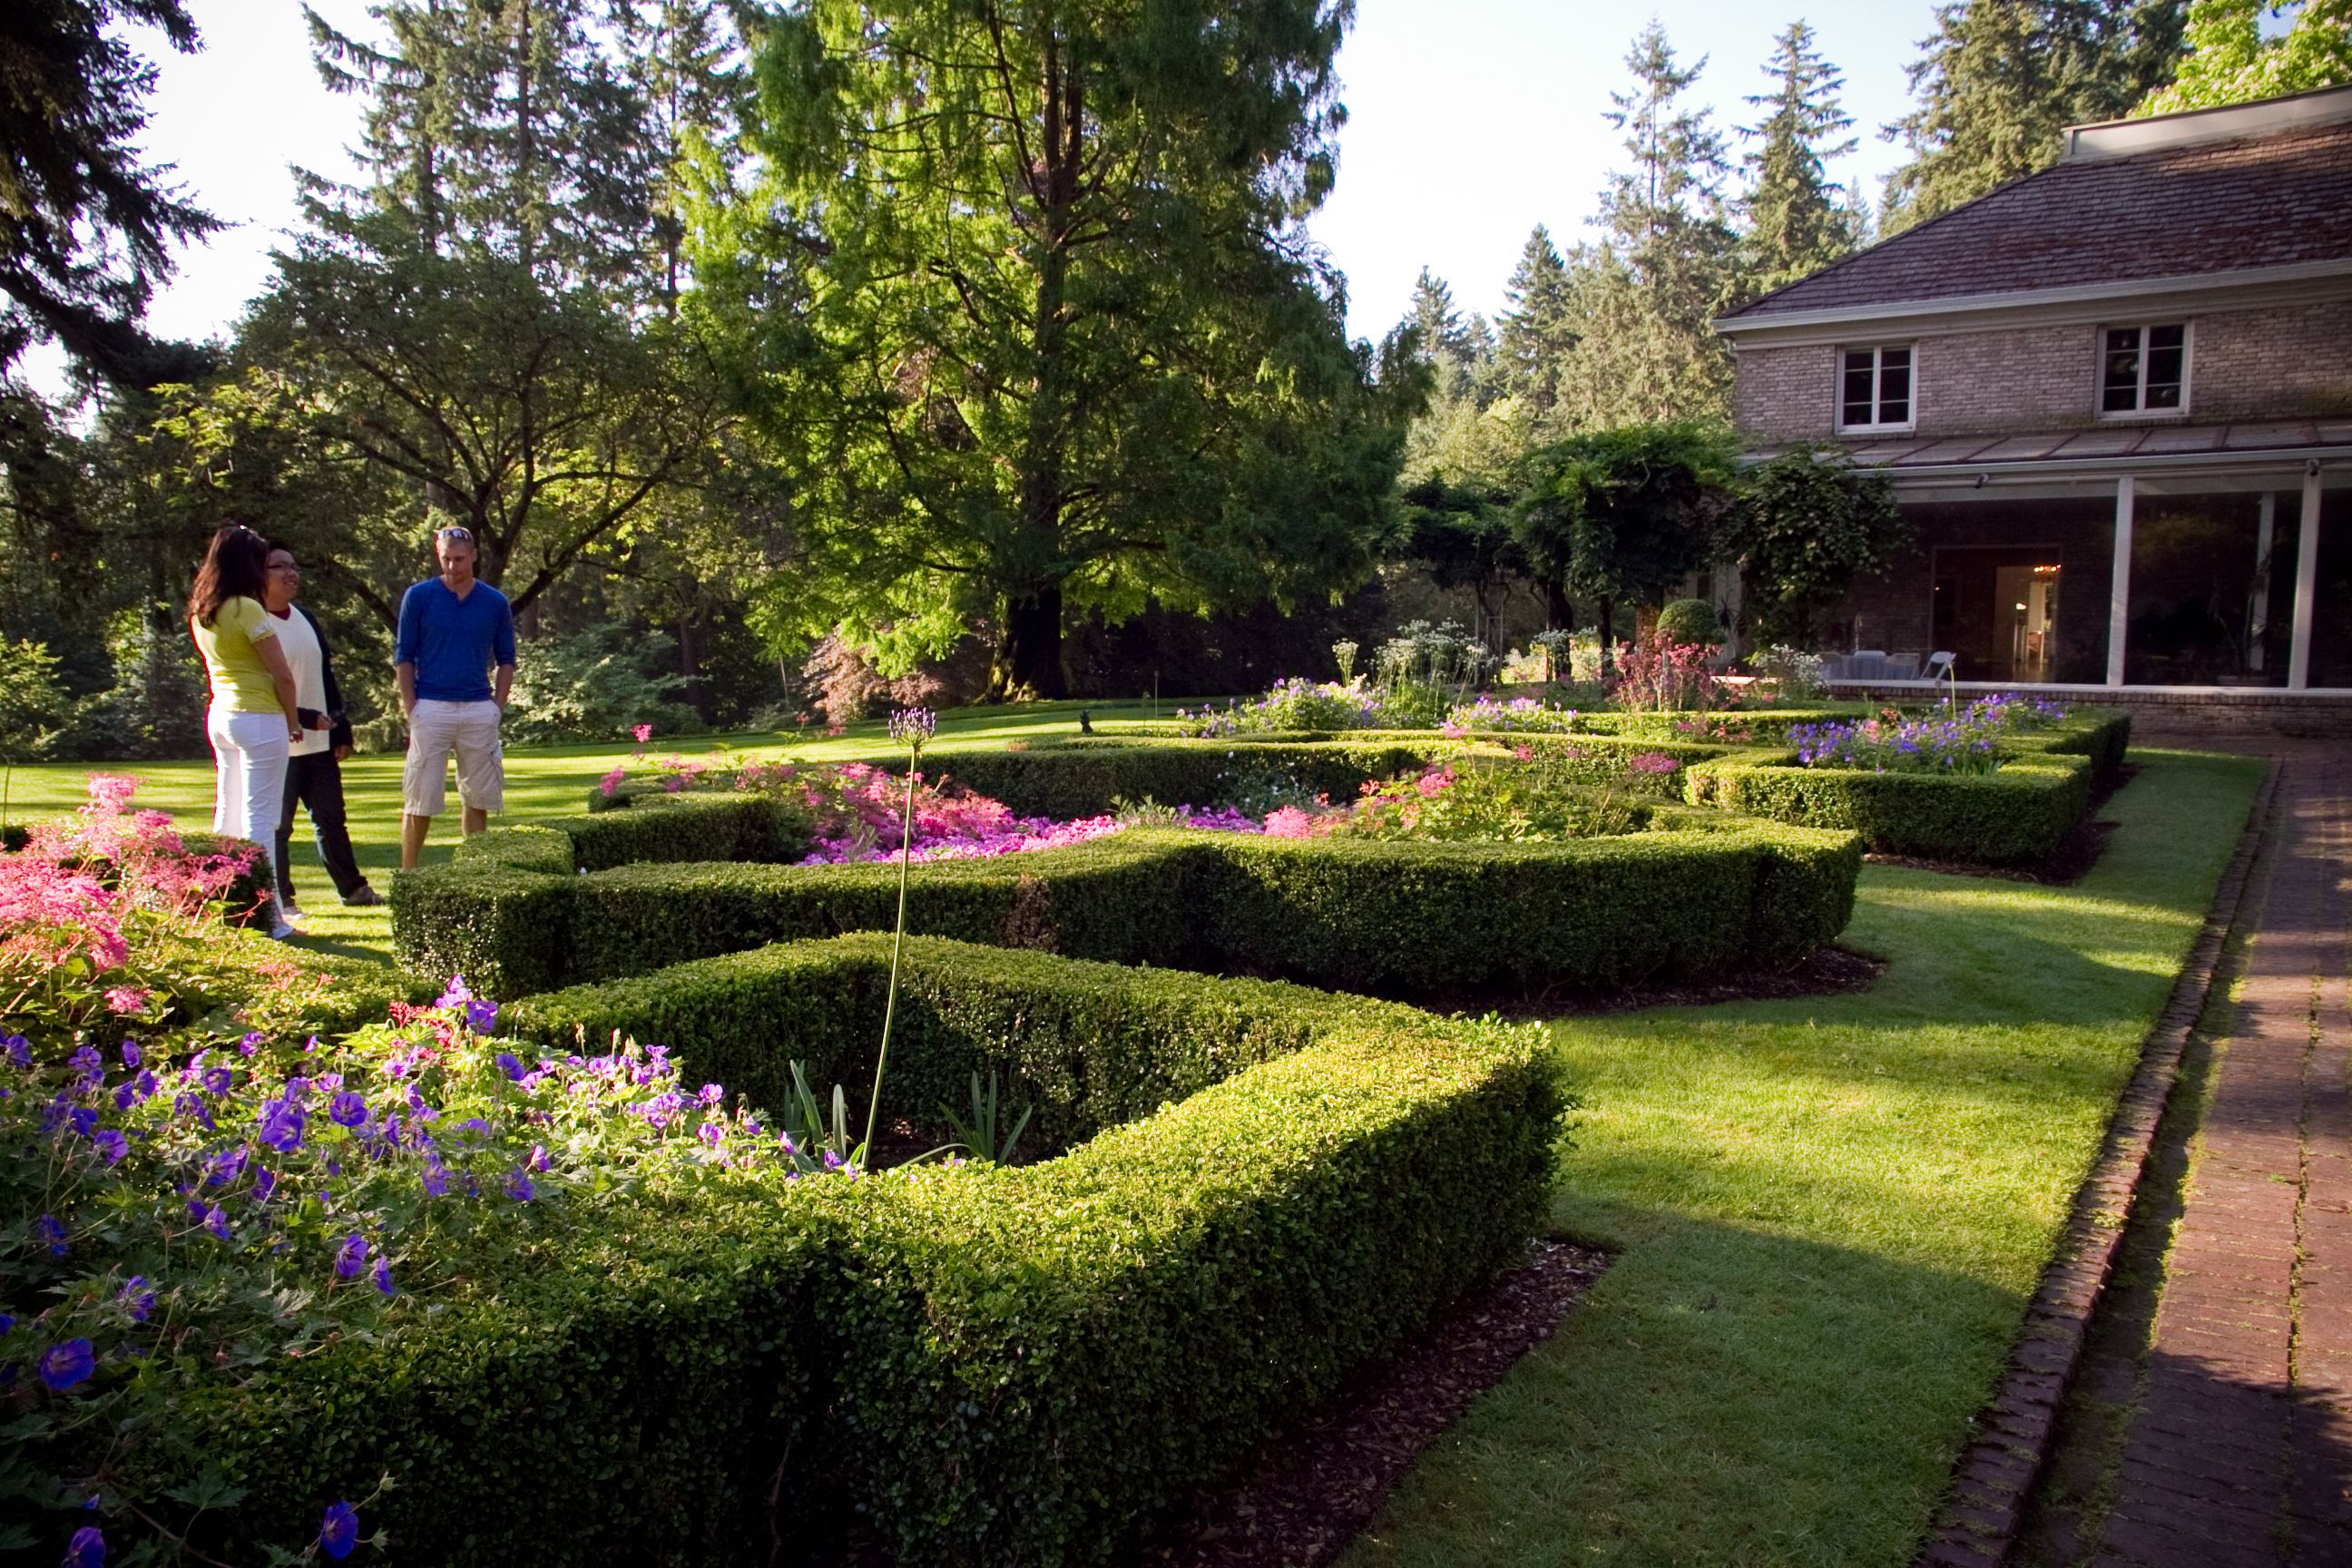 Embracing the long afternoon shadows at Lakewold Gardens in Lakewood, WA